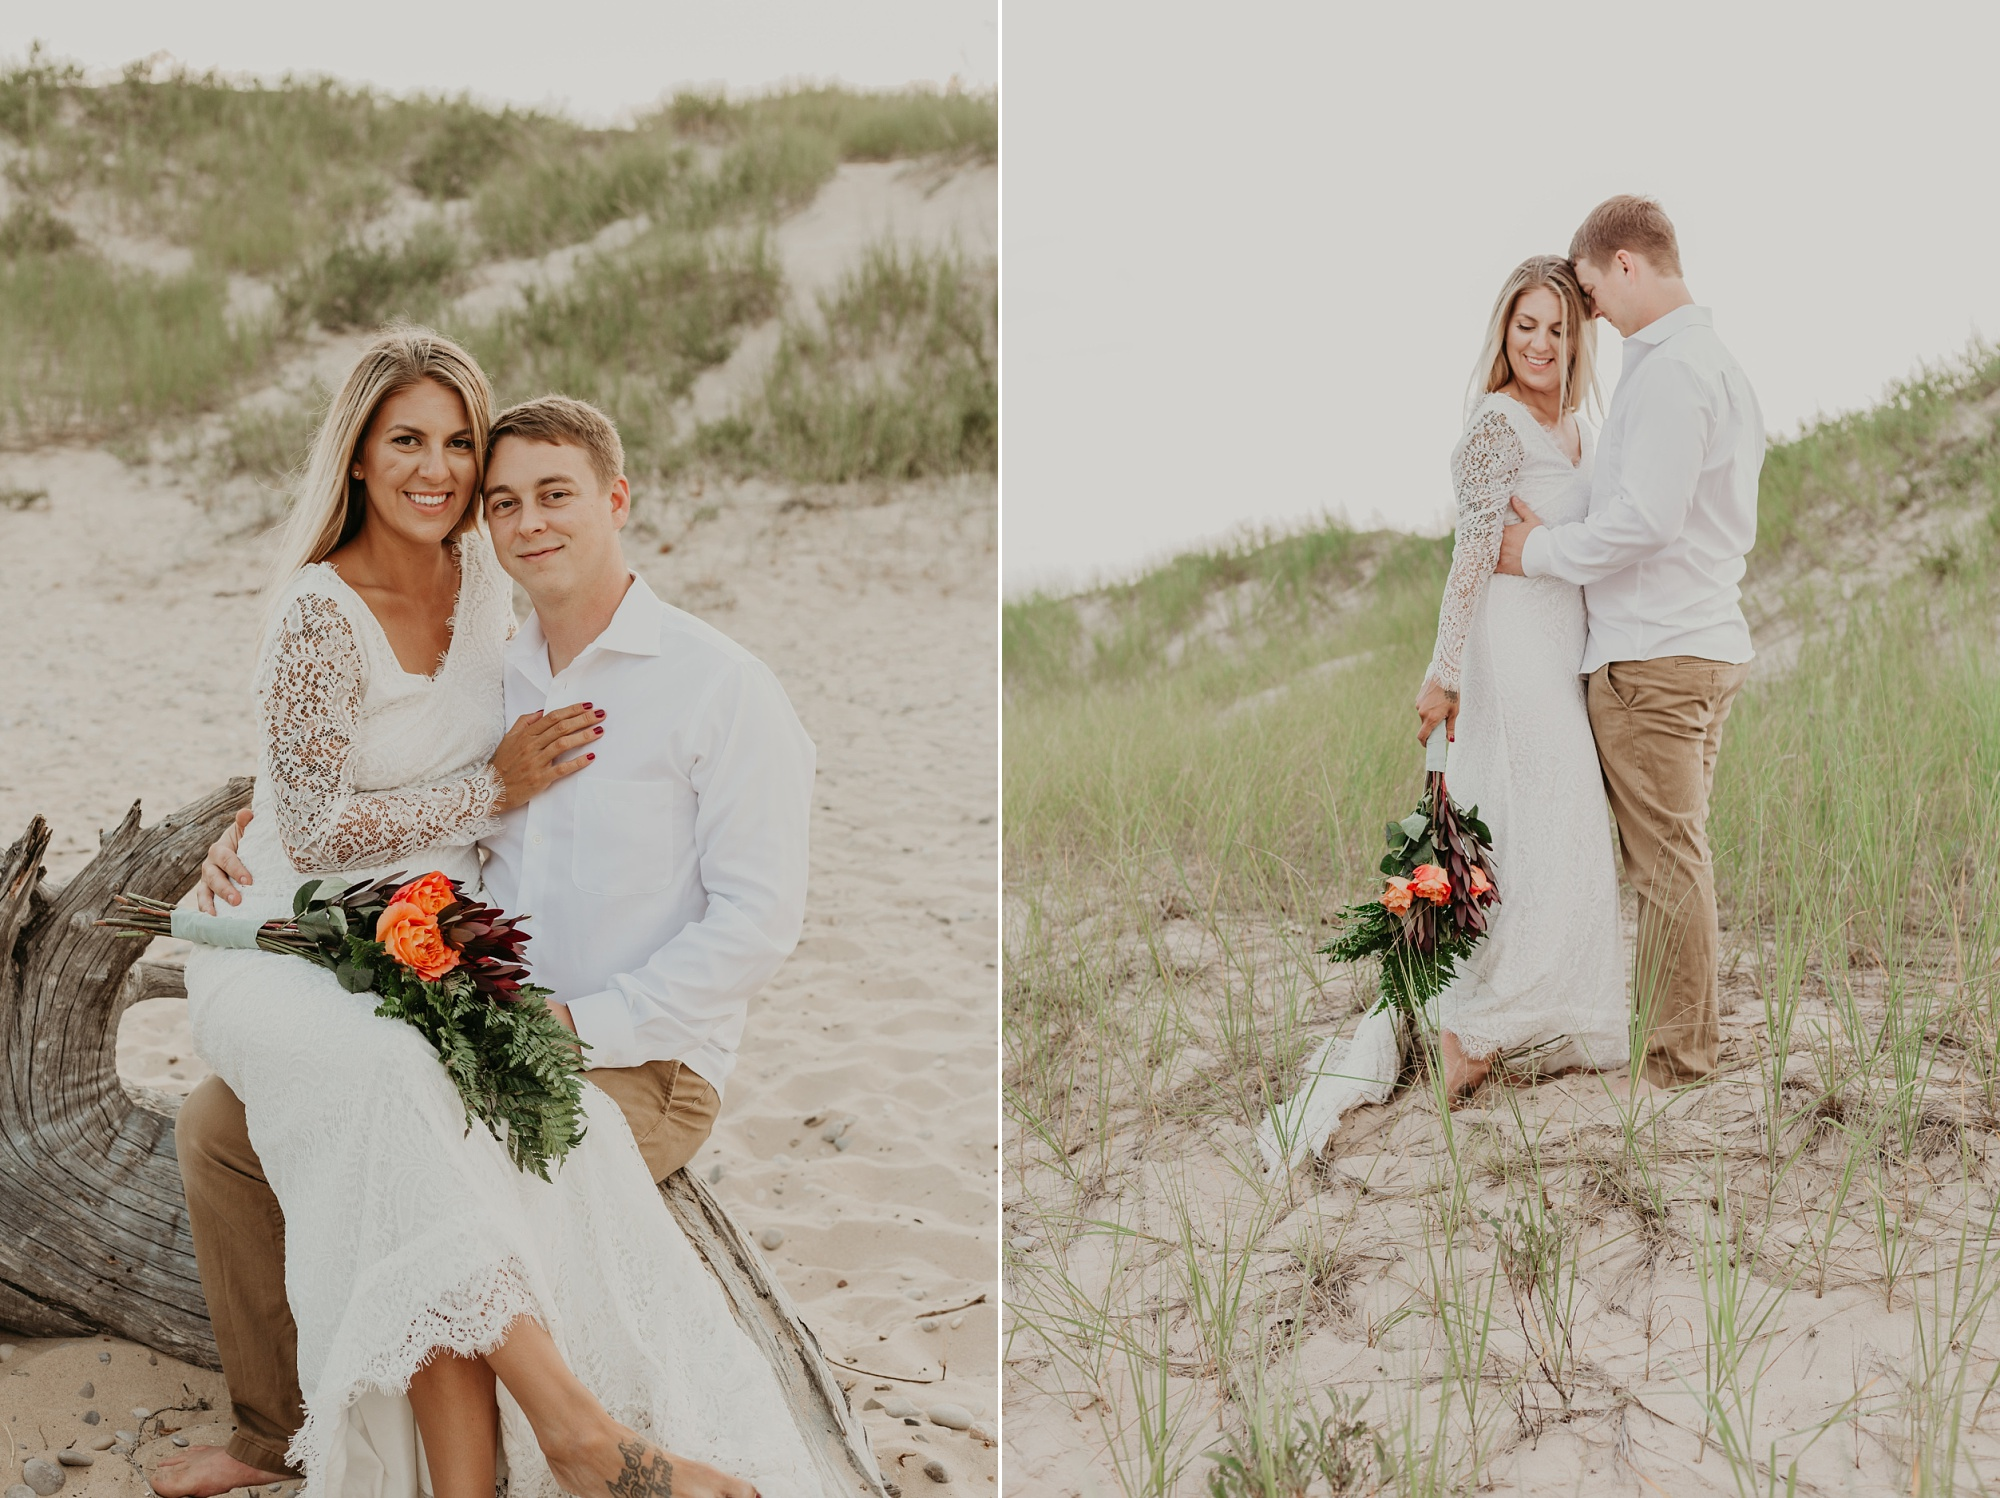 Petoskey elopement photographer